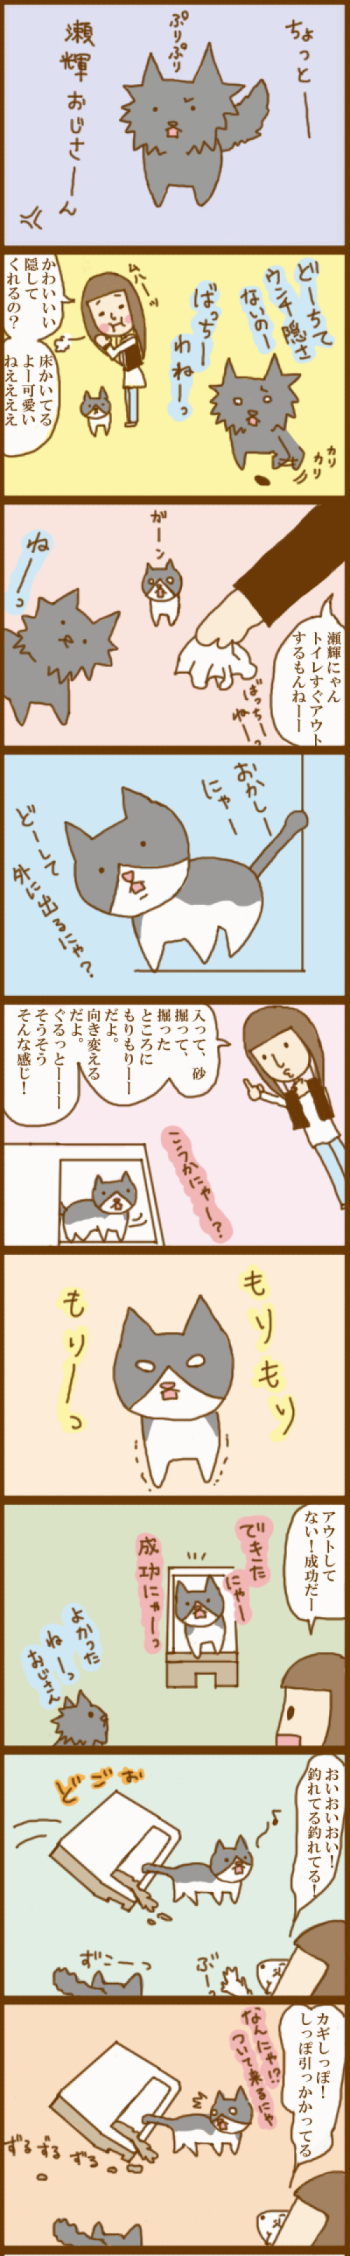 f:id:suzuokayu:20201017212153j:plain